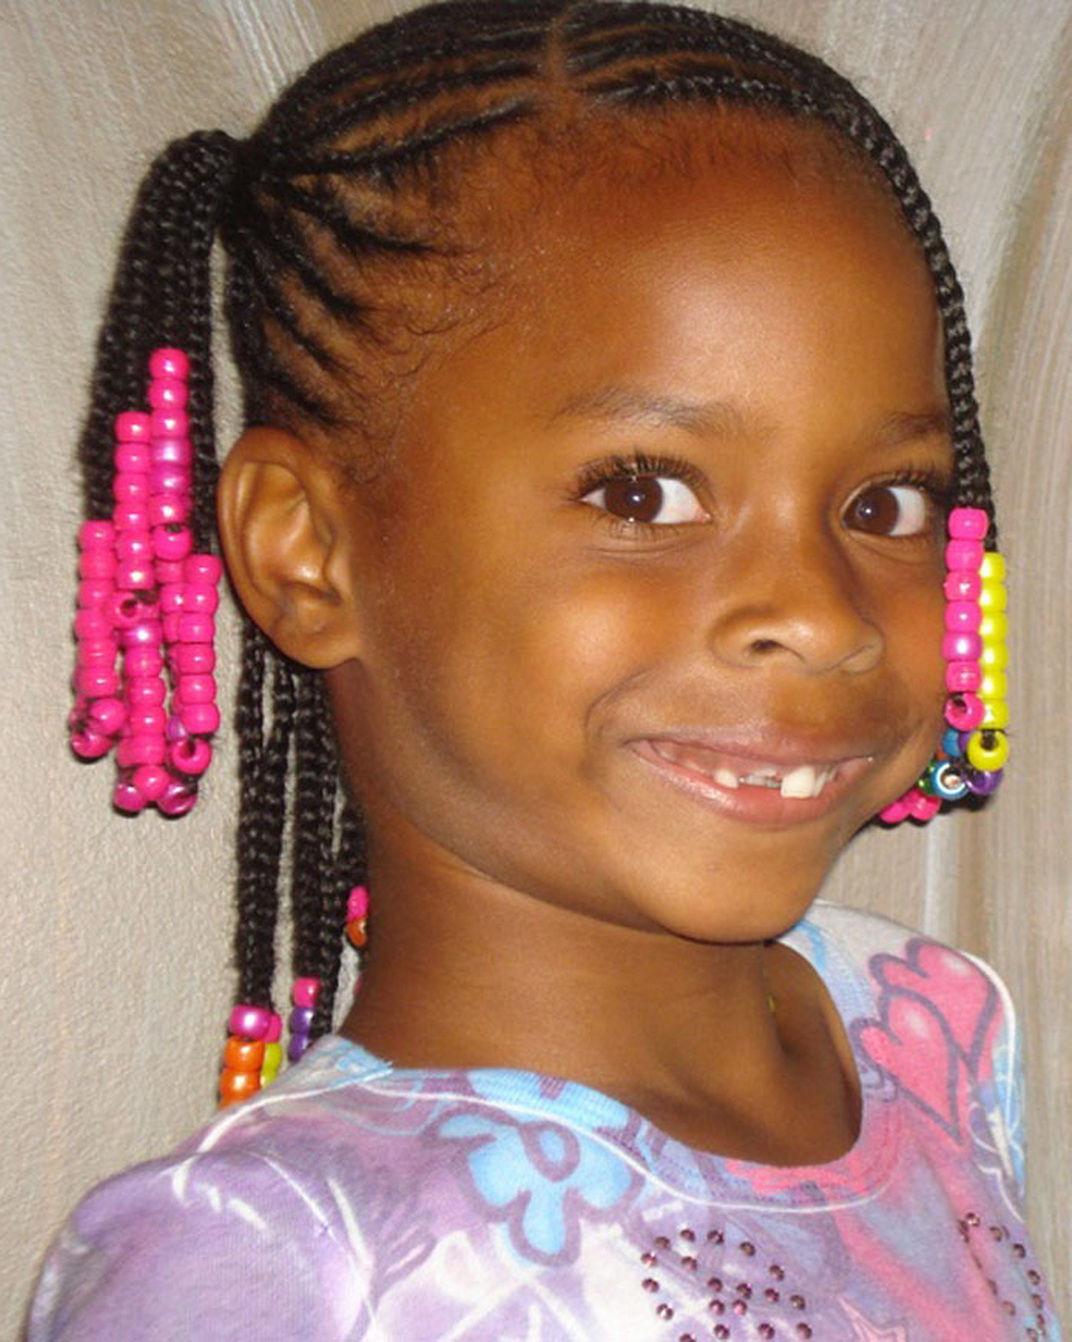 Little Black Girl Hairstyles  Black Girl Hairstyles Ideas That Turns Head The Xerxes